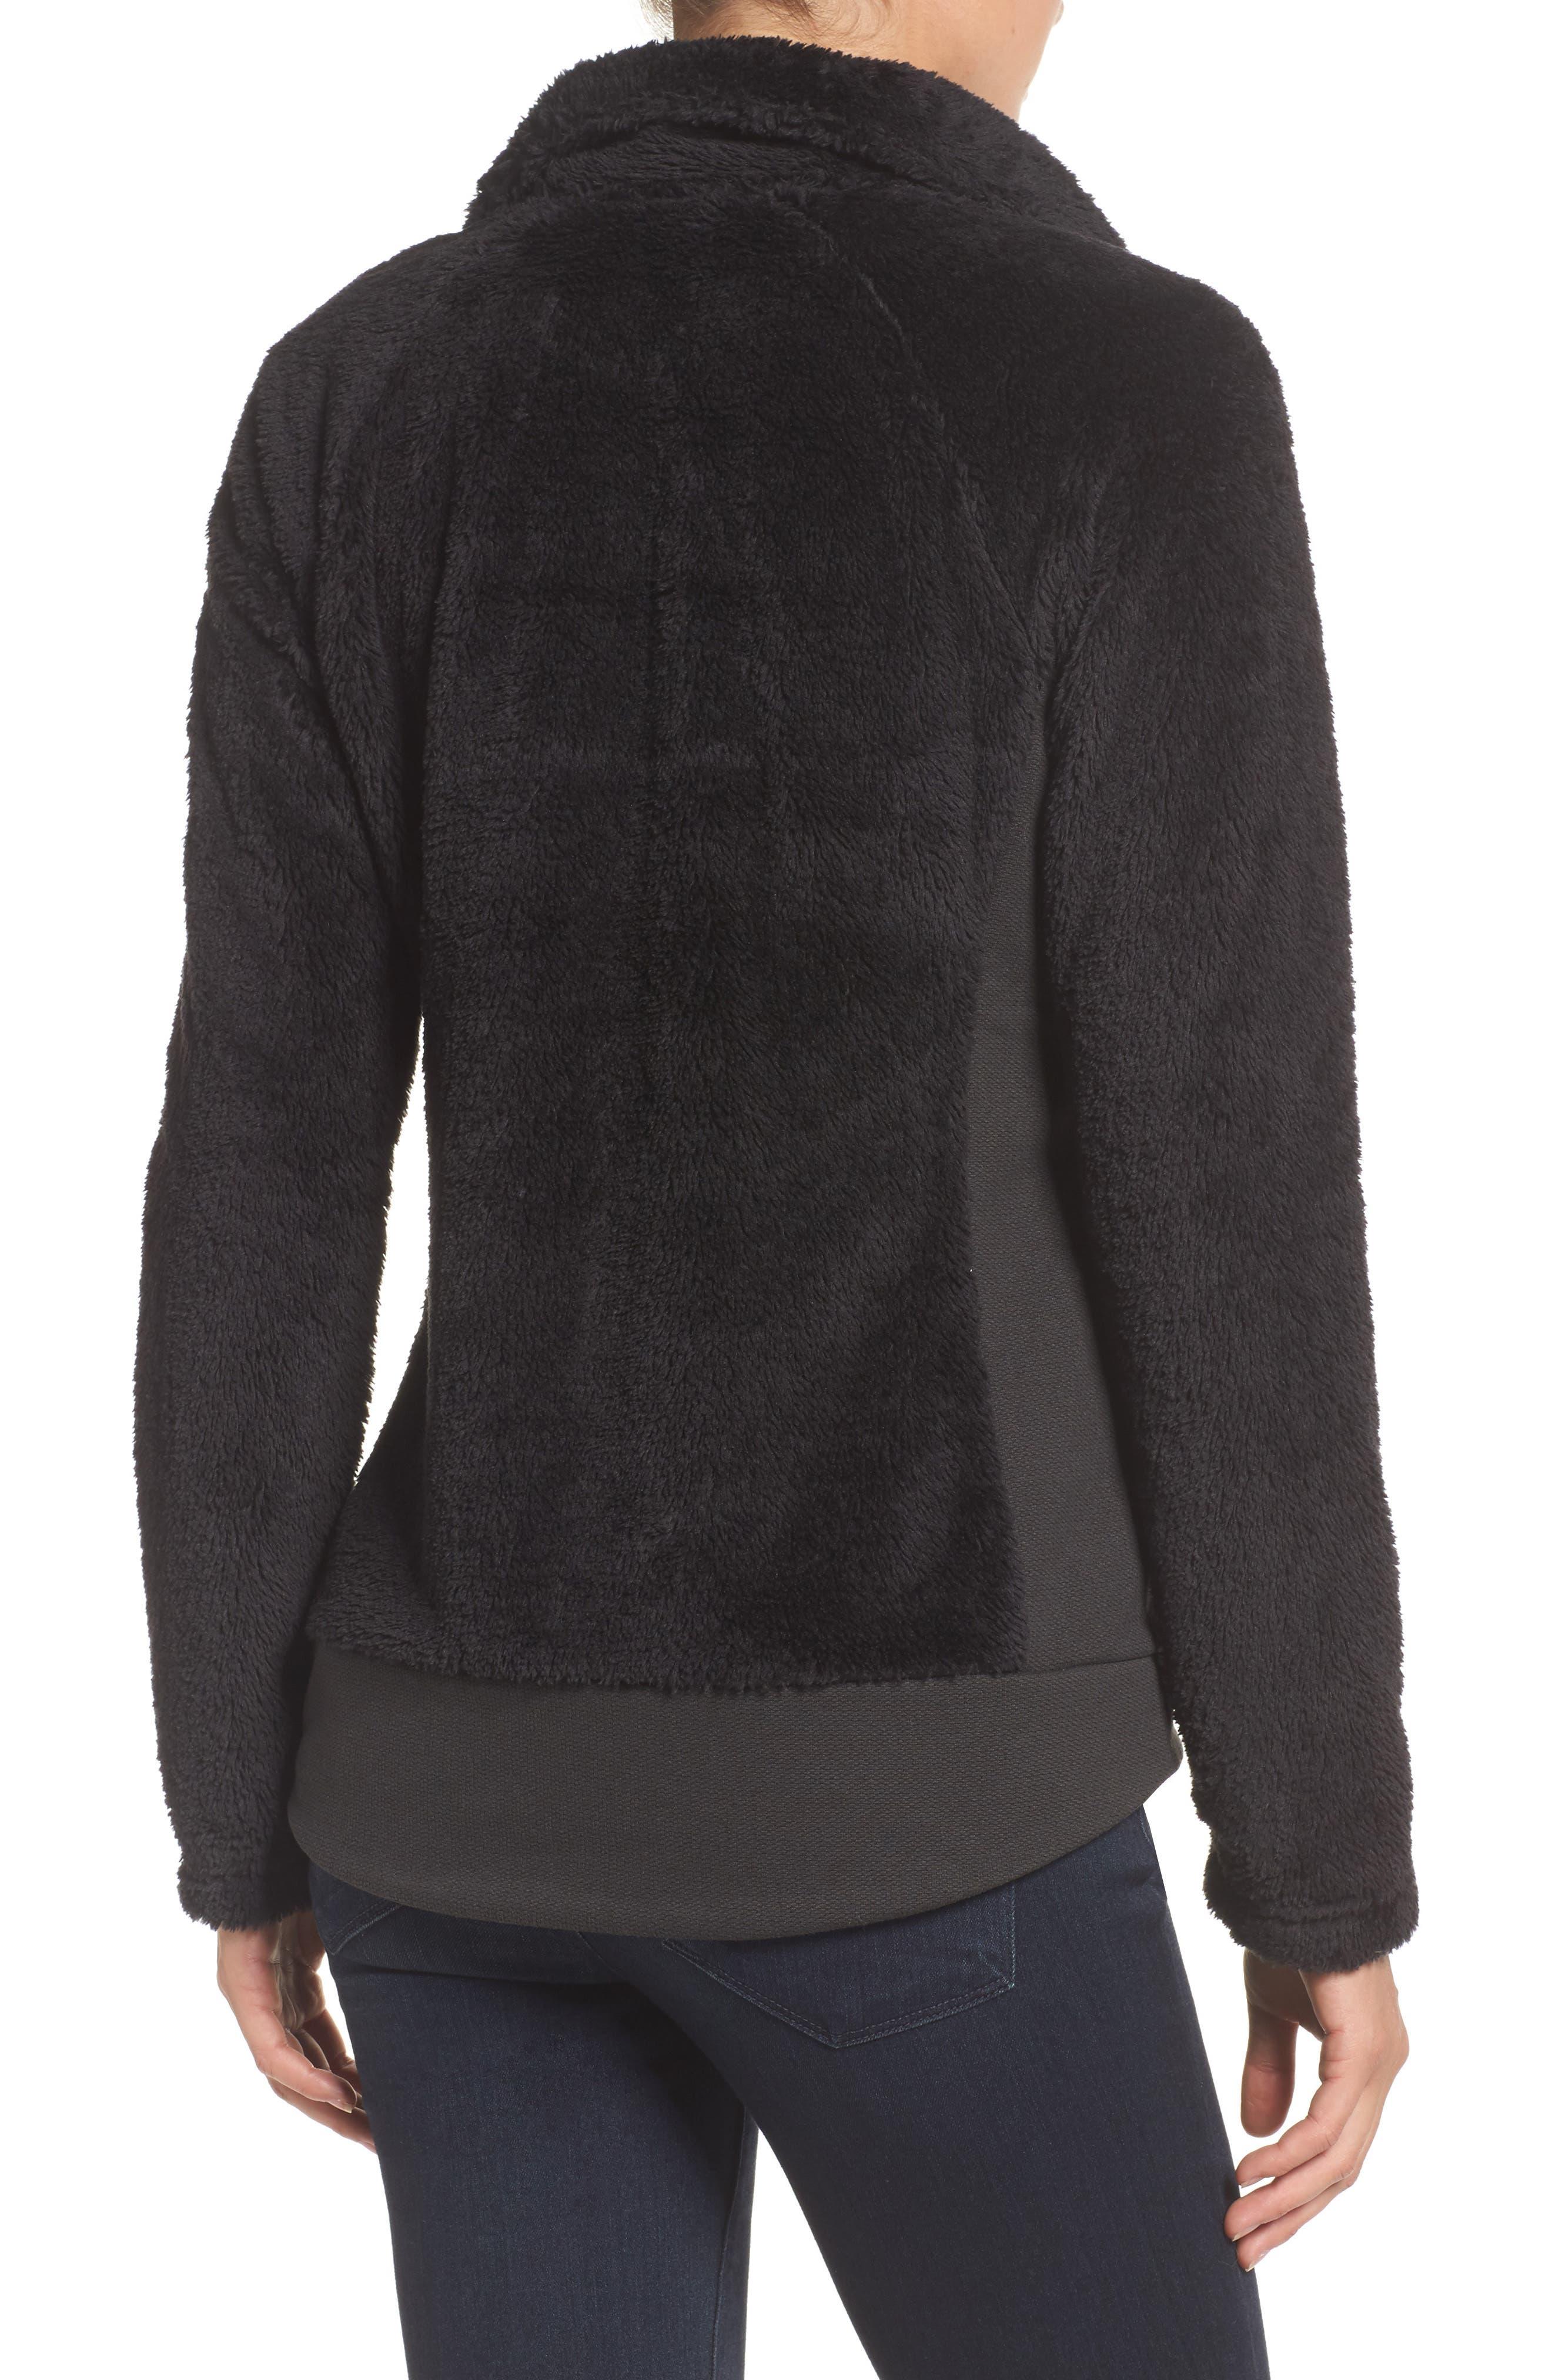 Furry Fleece Jacket,                             Alternate thumbnail 2, color,                             TNF BLACK